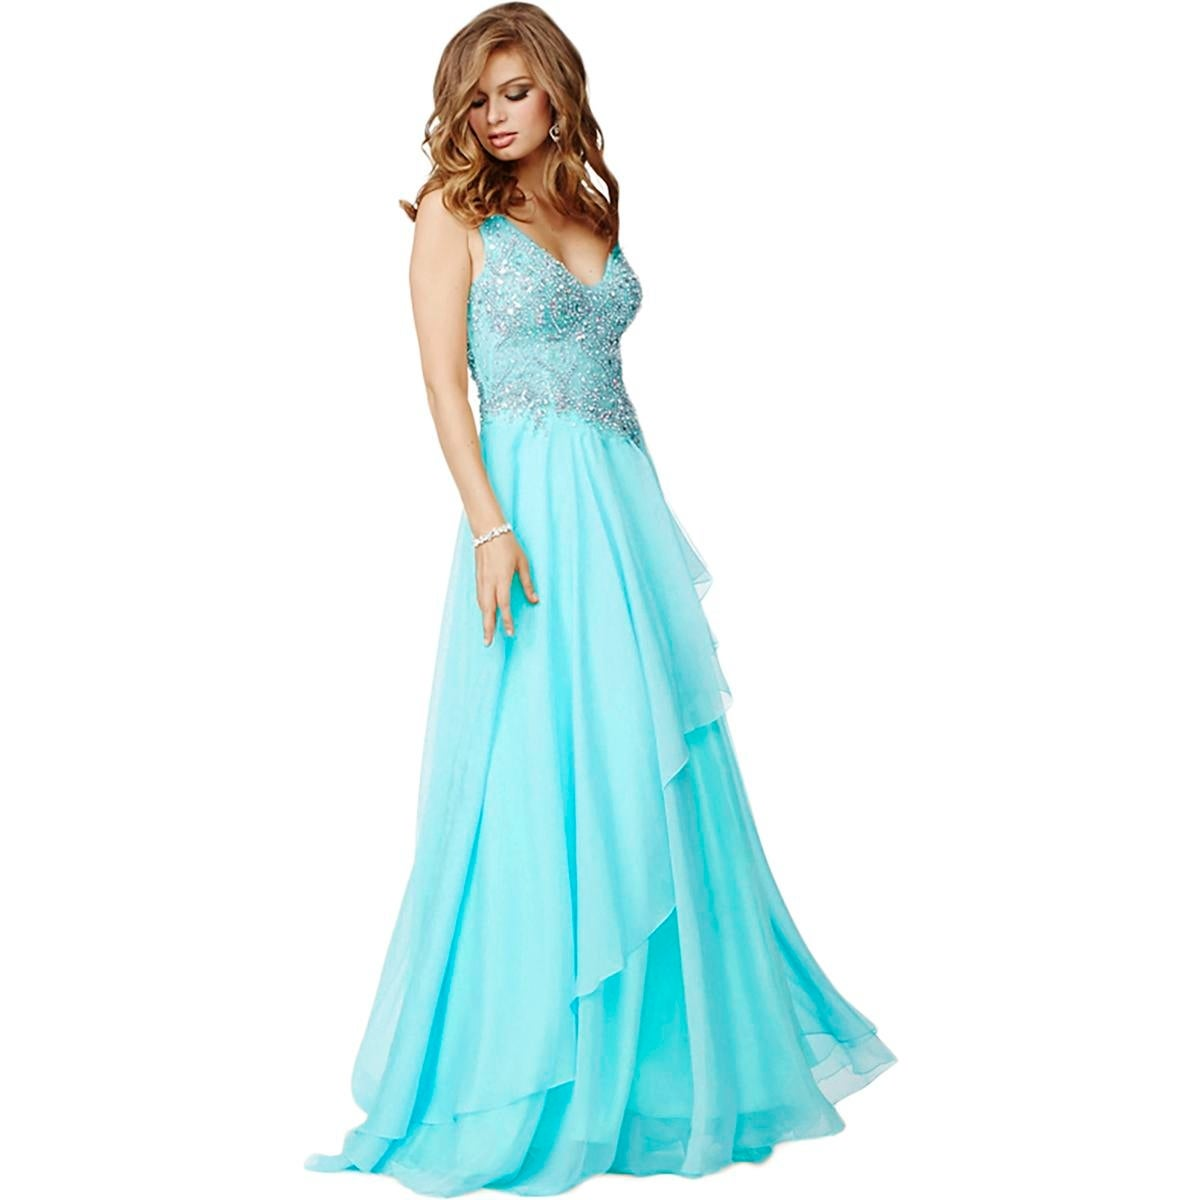 JVN by Jovani Womens Formal Dress Chiffon Embellished - Free ...